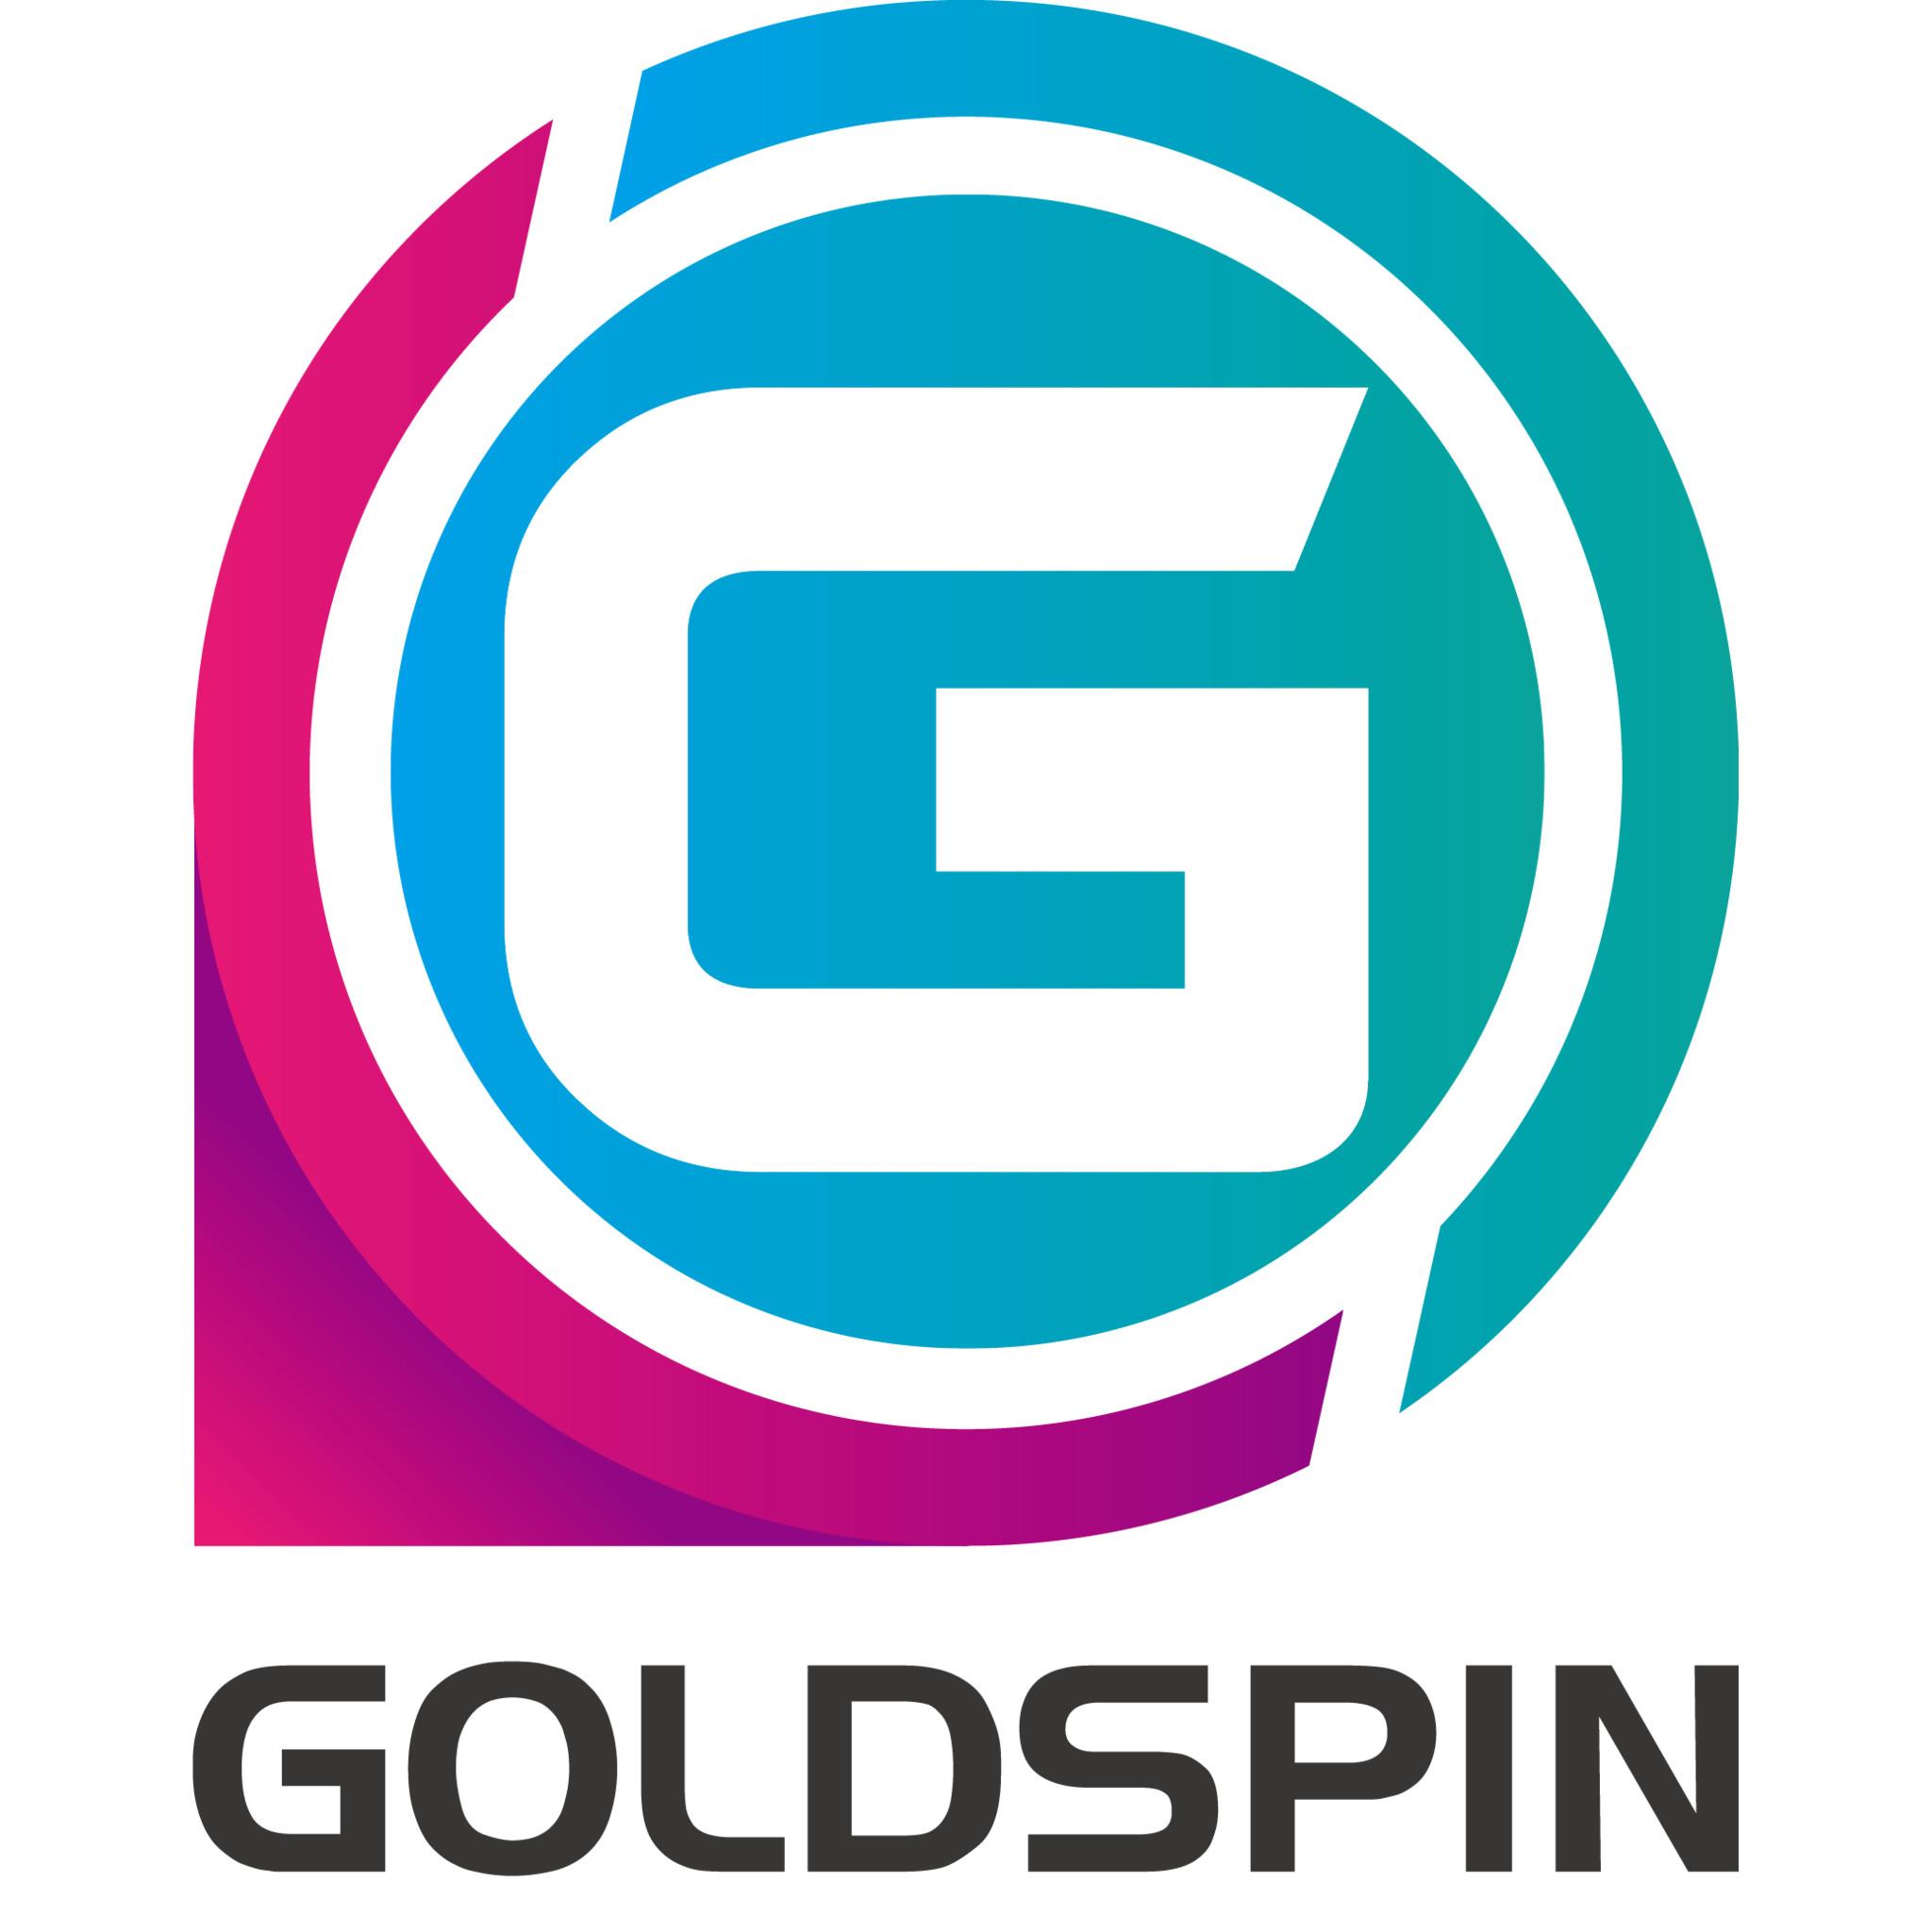 GOLDSPIN